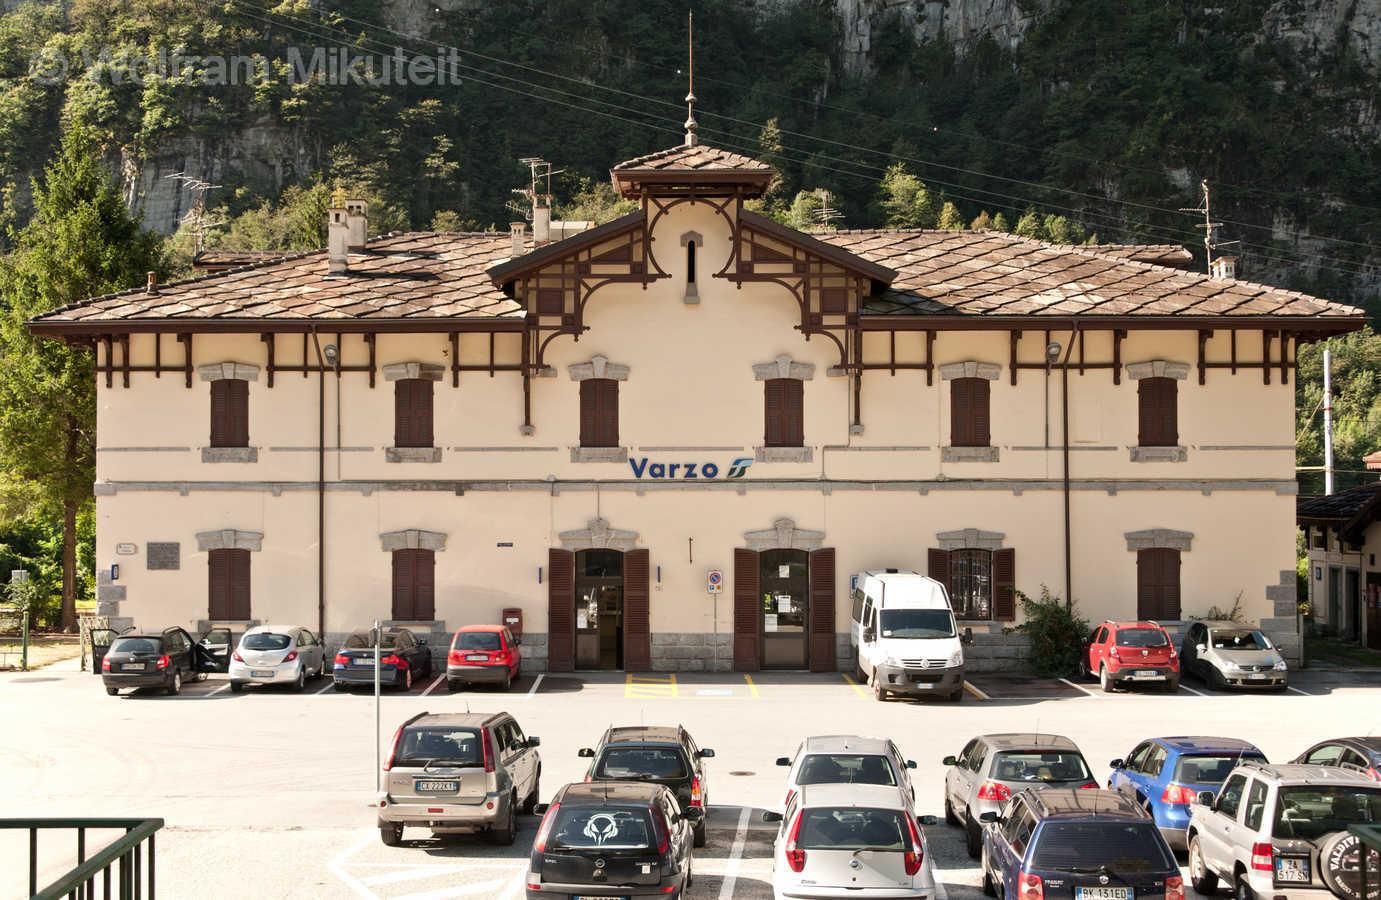 Bahnhof in Varzo